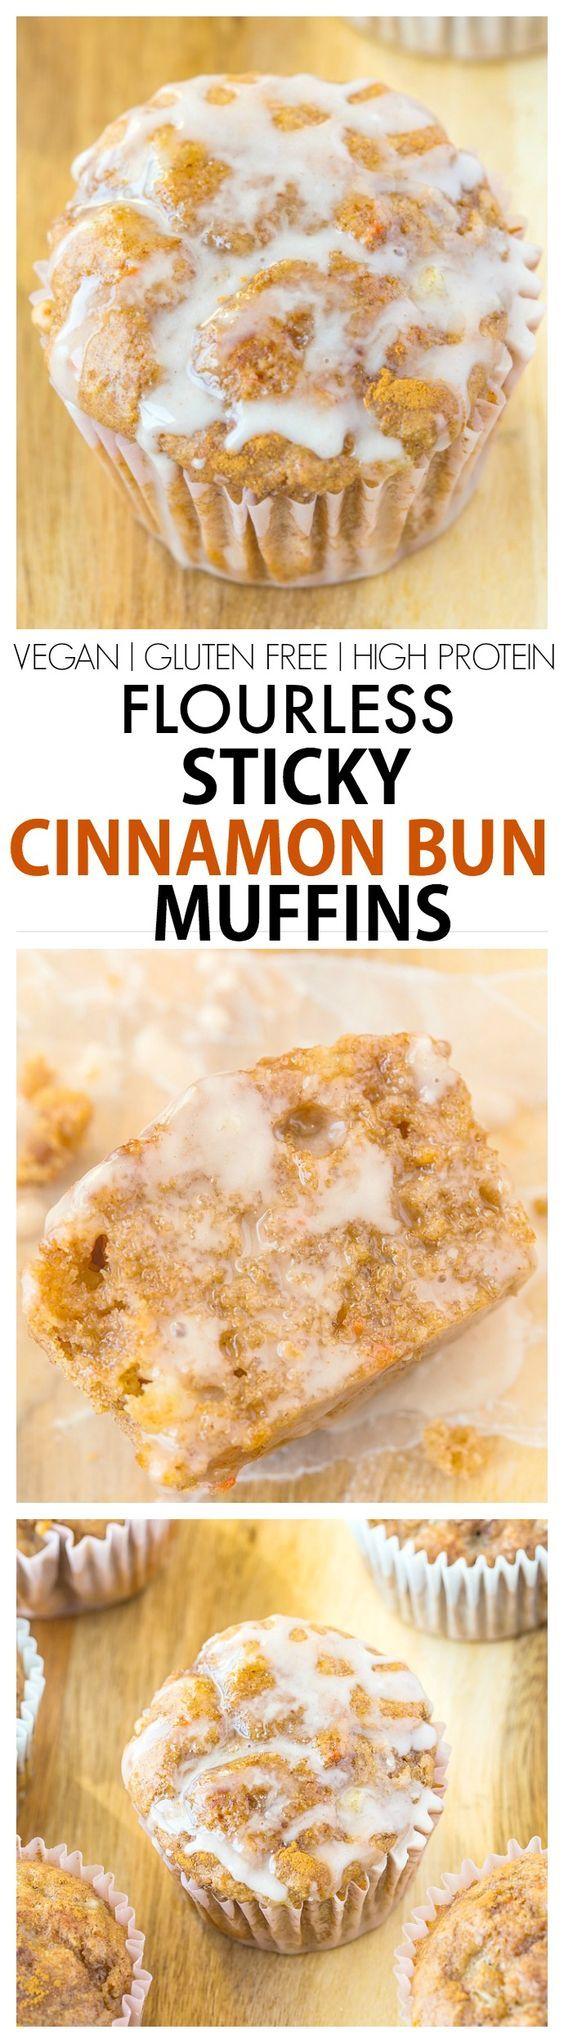 Healthy Flourless Sticky Cinnamon Bun Muffin recipe- Delicious, quick ...